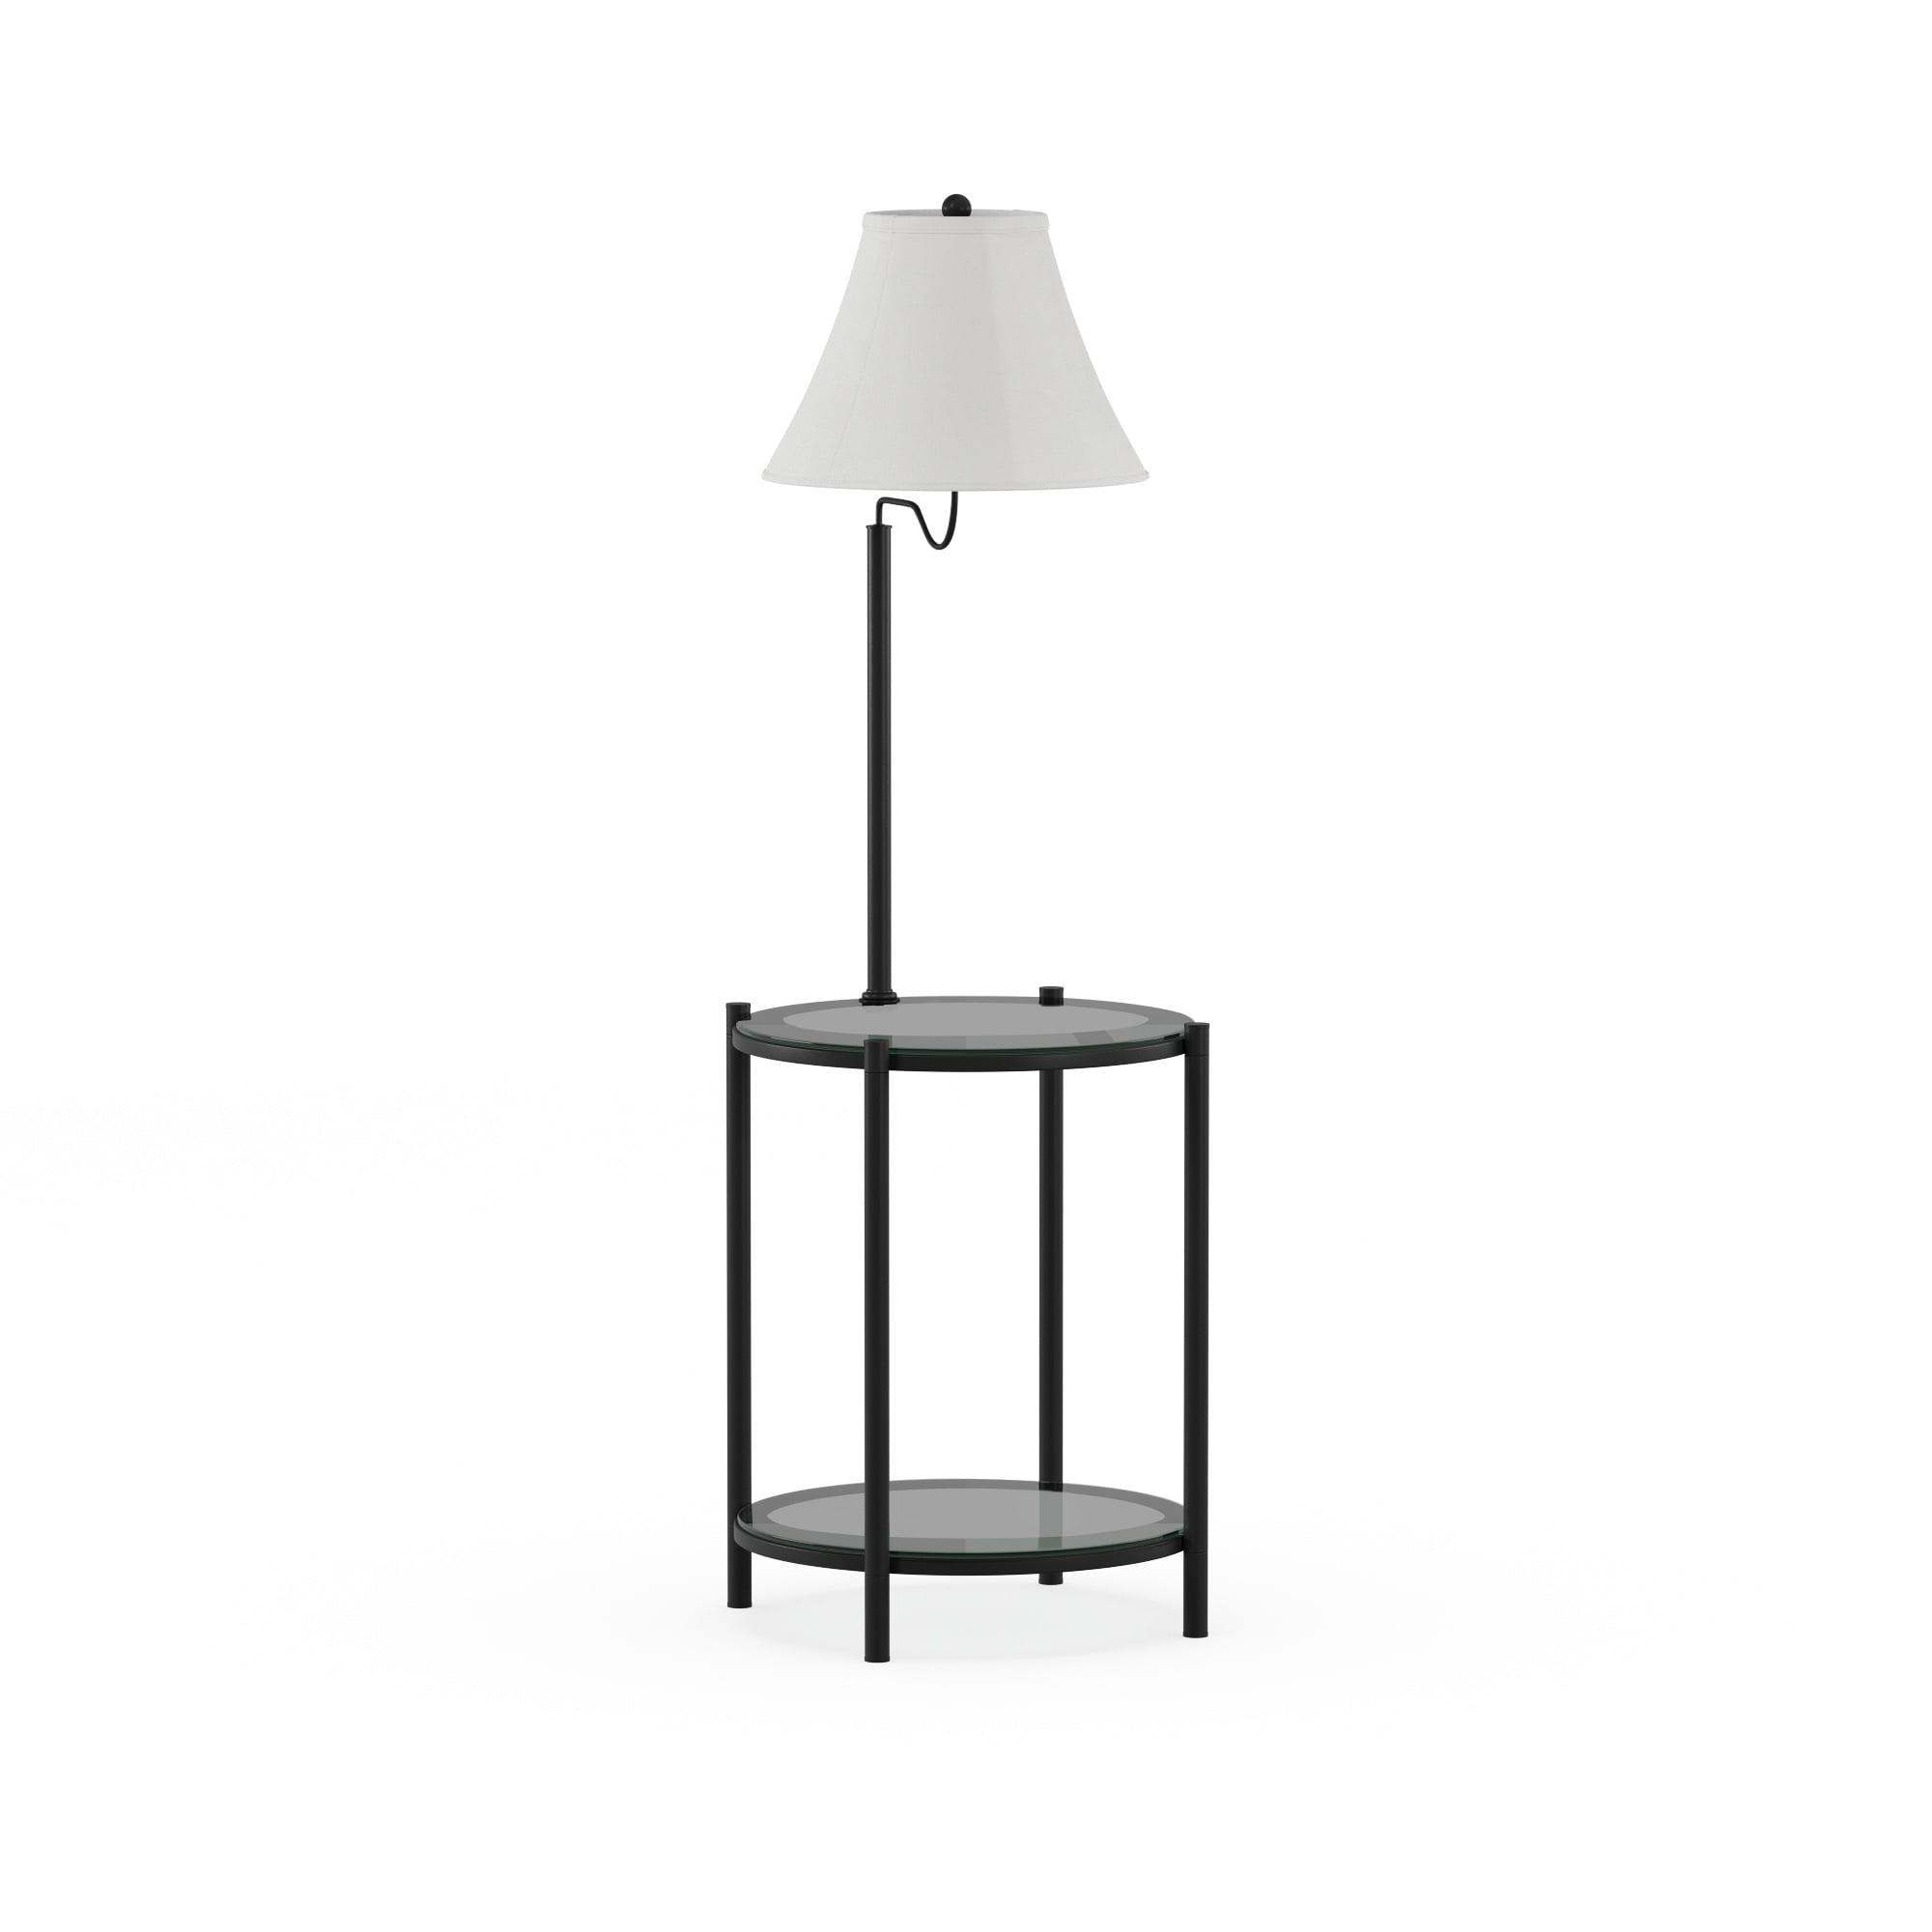 Mainstays Glass End Table Floor Lamp Matte Black Cfl Bulb Included Walmart Com Walmart Com